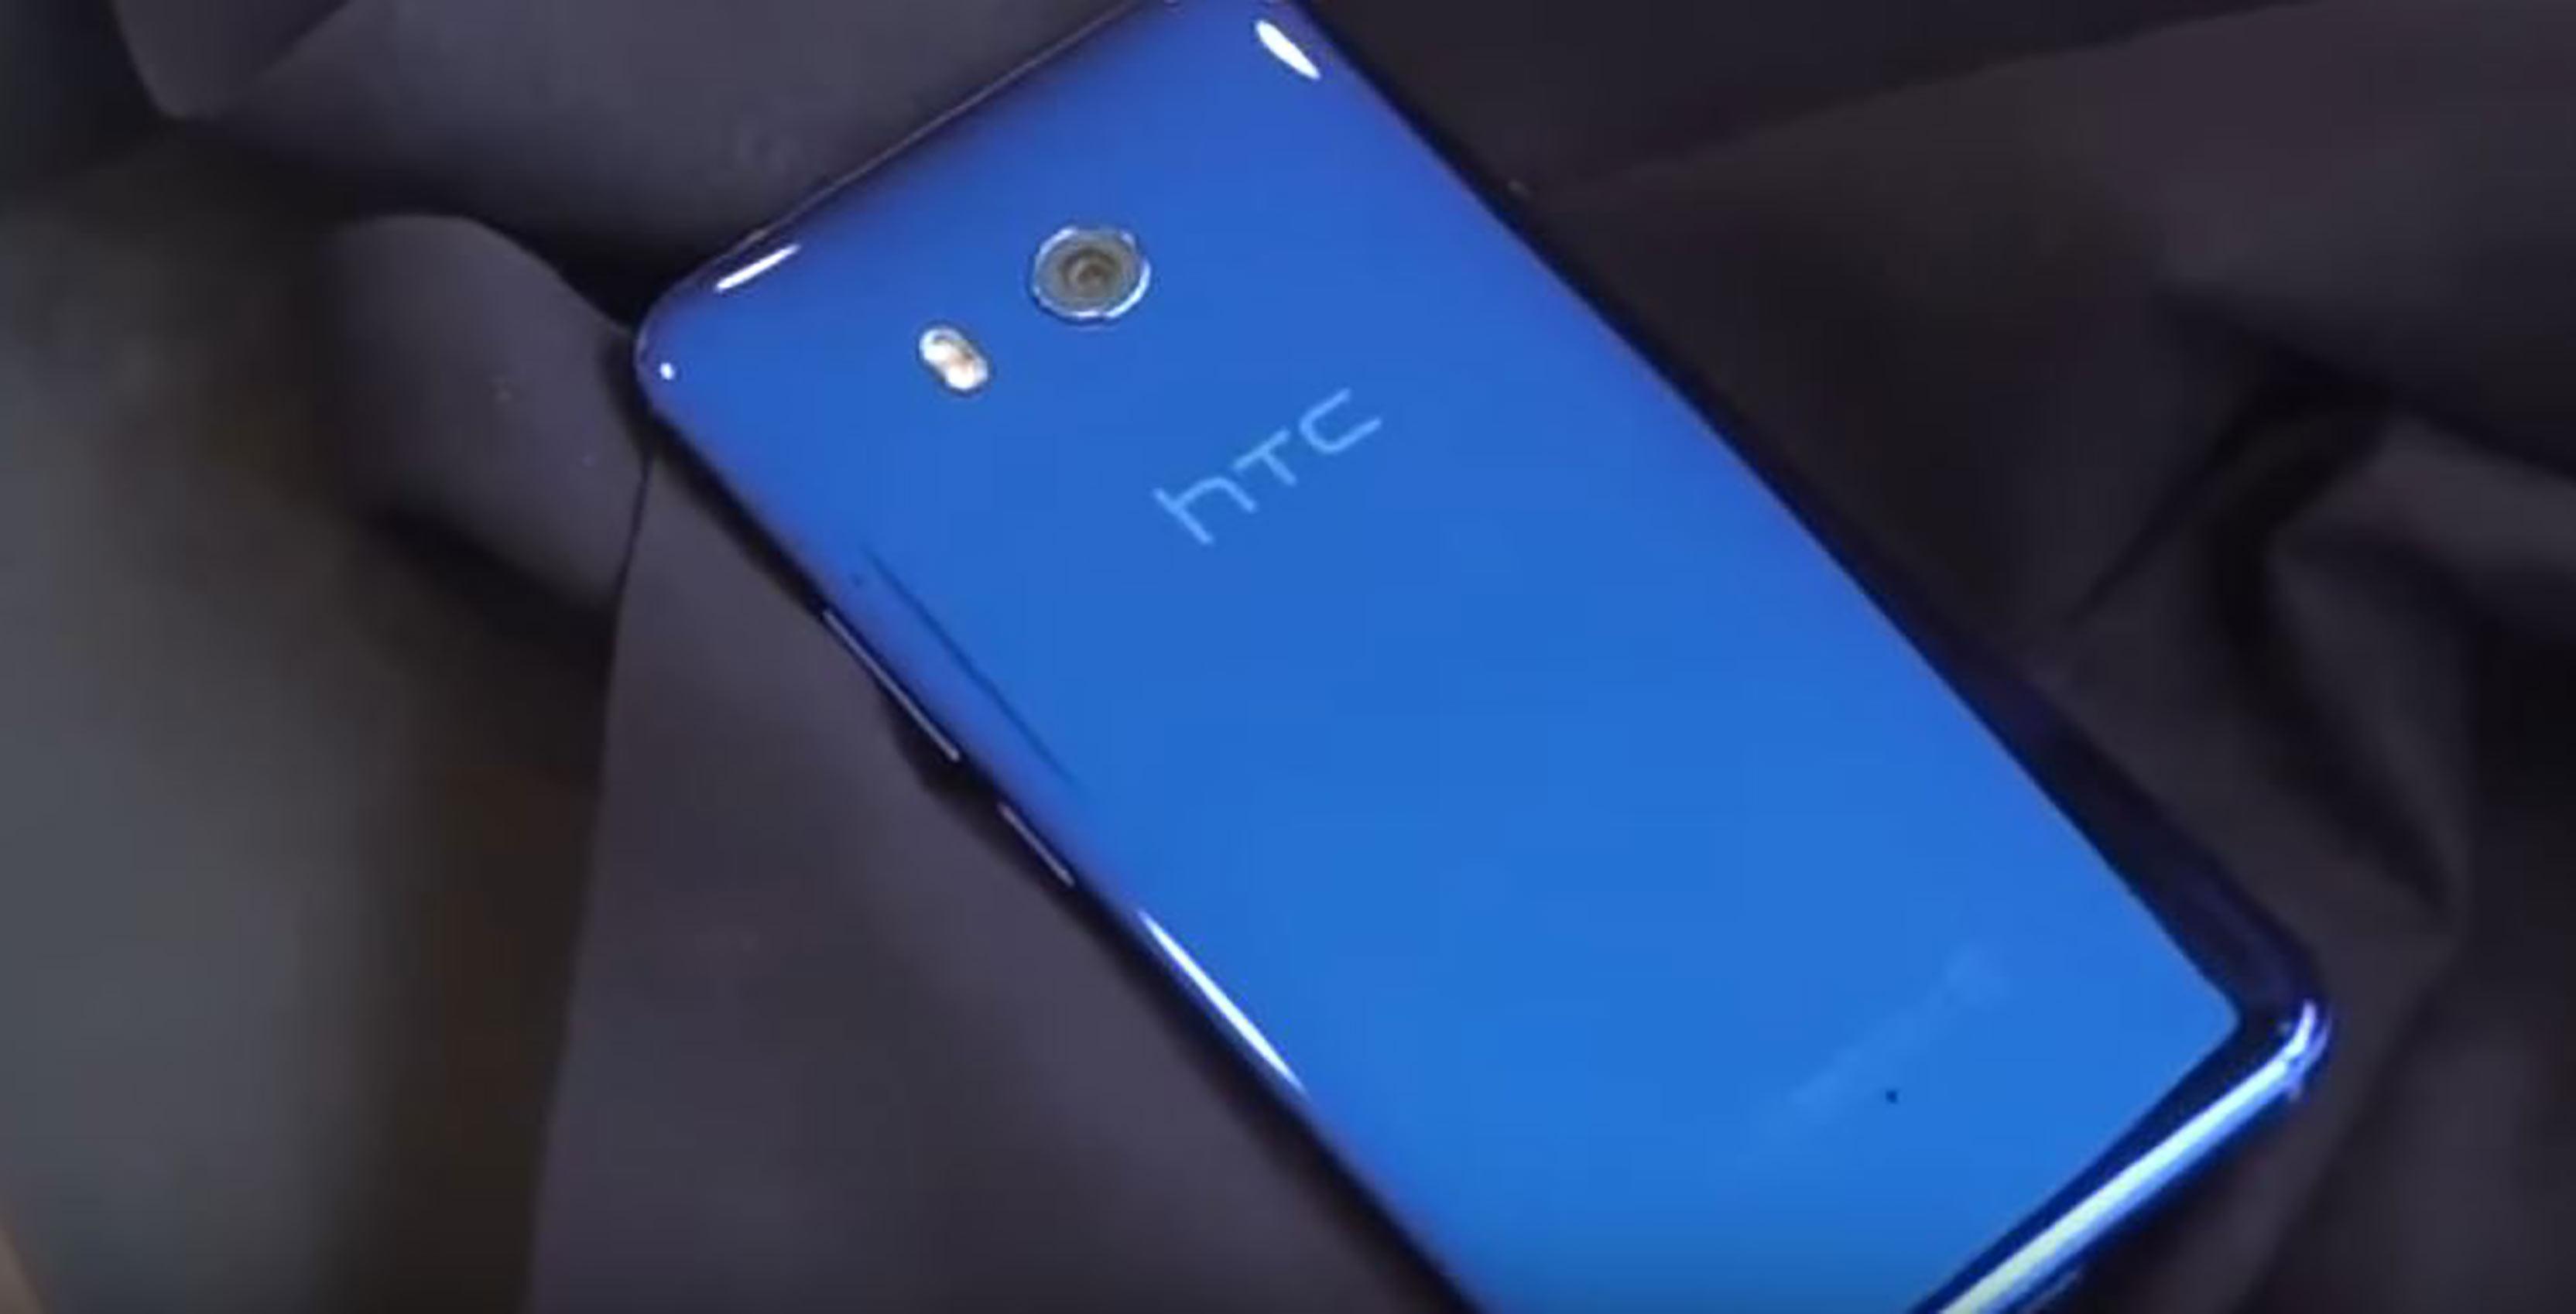 HTC U11's rear